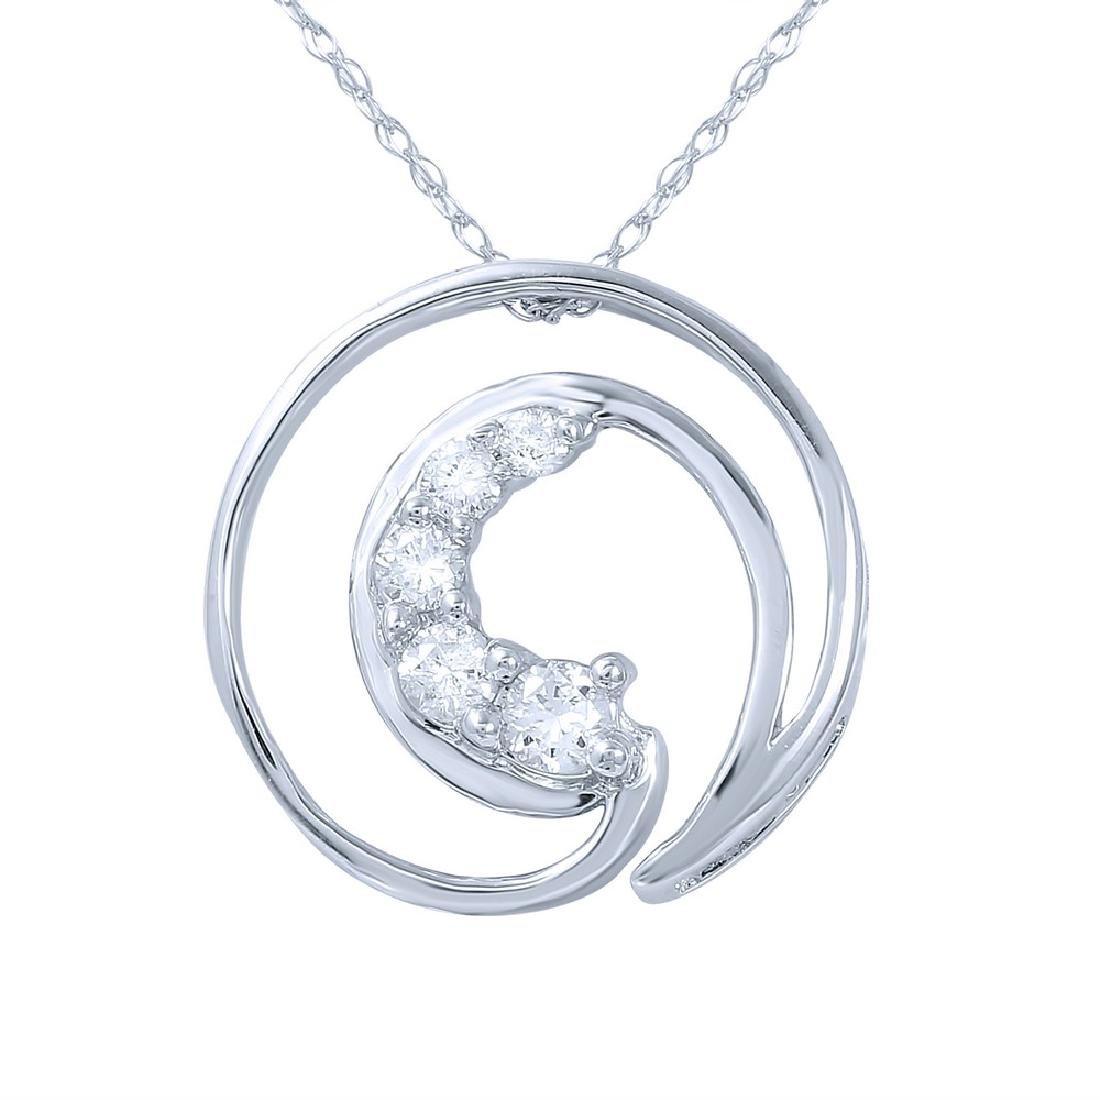 Genuine 0.25 TCW 14K White Gold Ladies Necklace